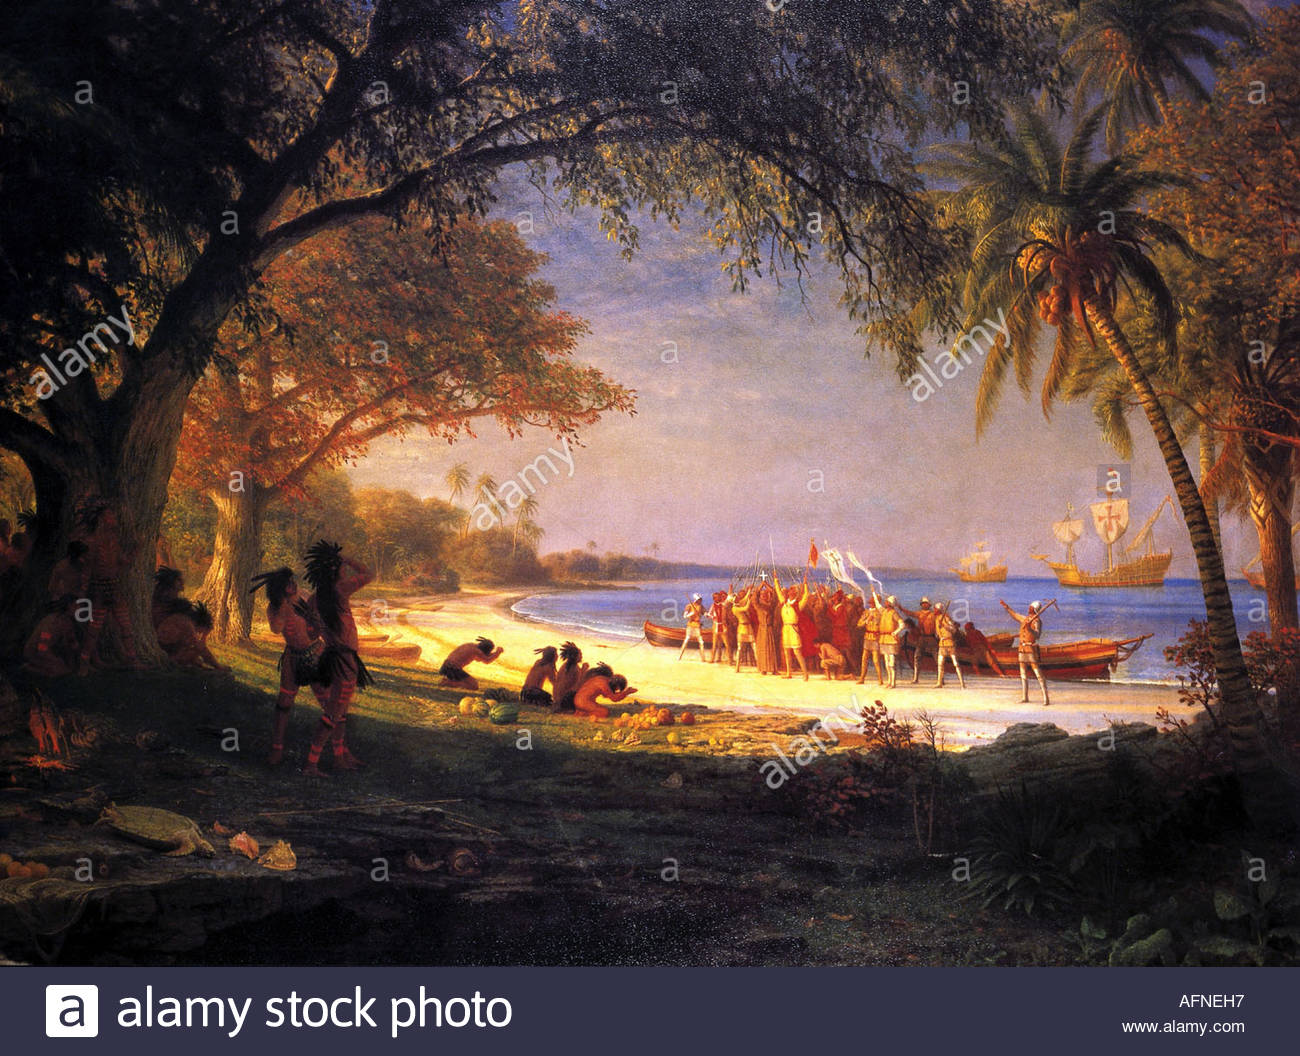 Columbus, Christopher, 1451 - 20.5.1506, el explorador italiano, escena, llegando a Guanahani, 12.10.1492, historia, Imagen De Stock